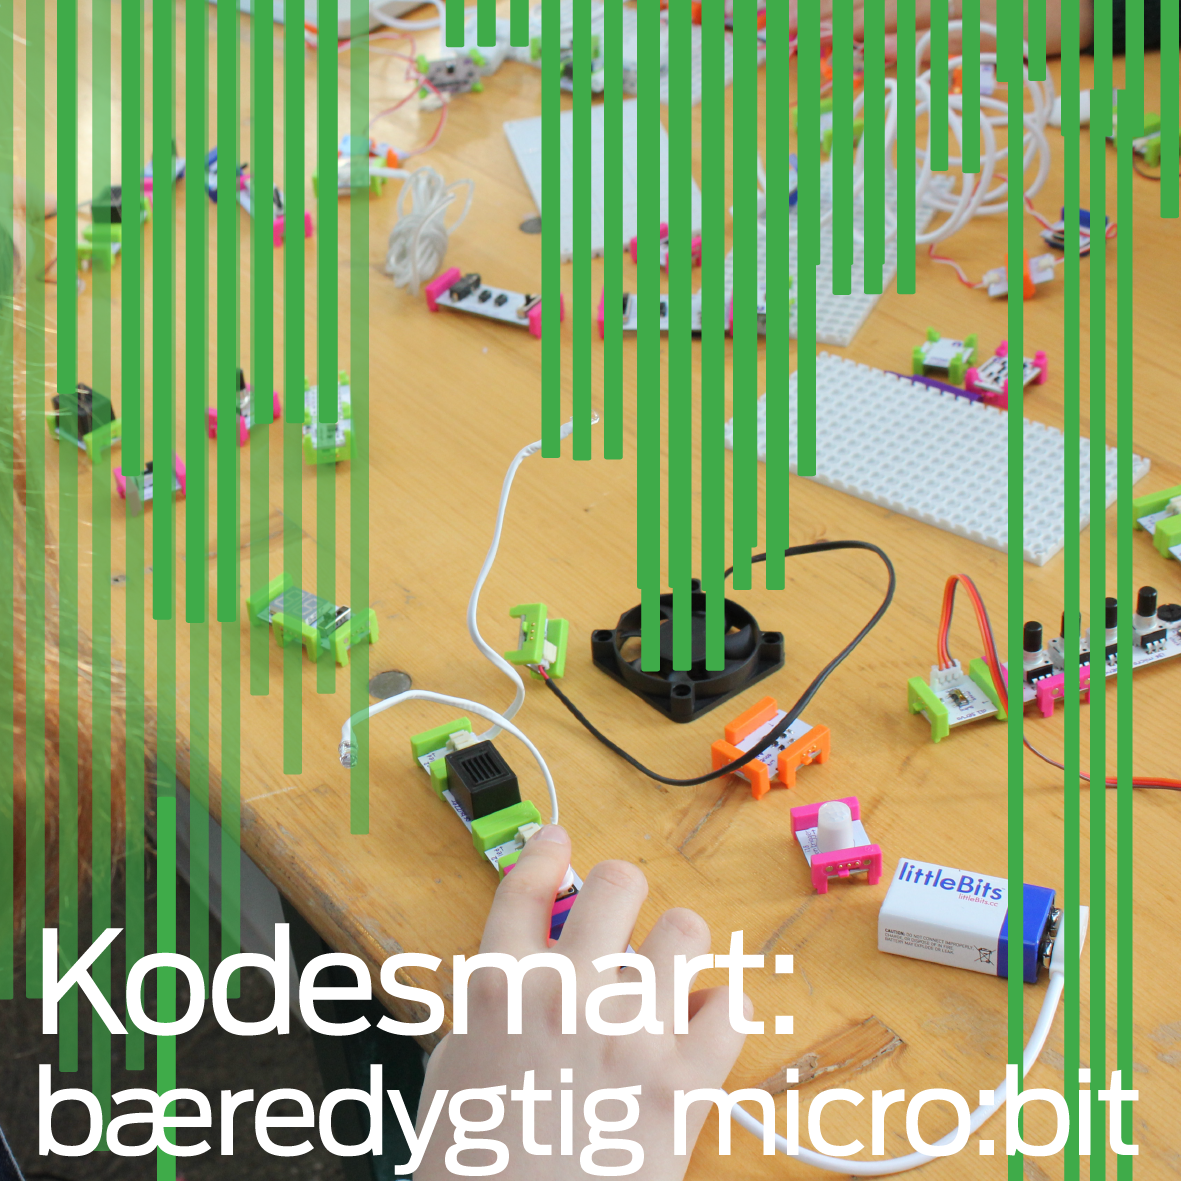 Kodesmart: Sustainable micro:bit